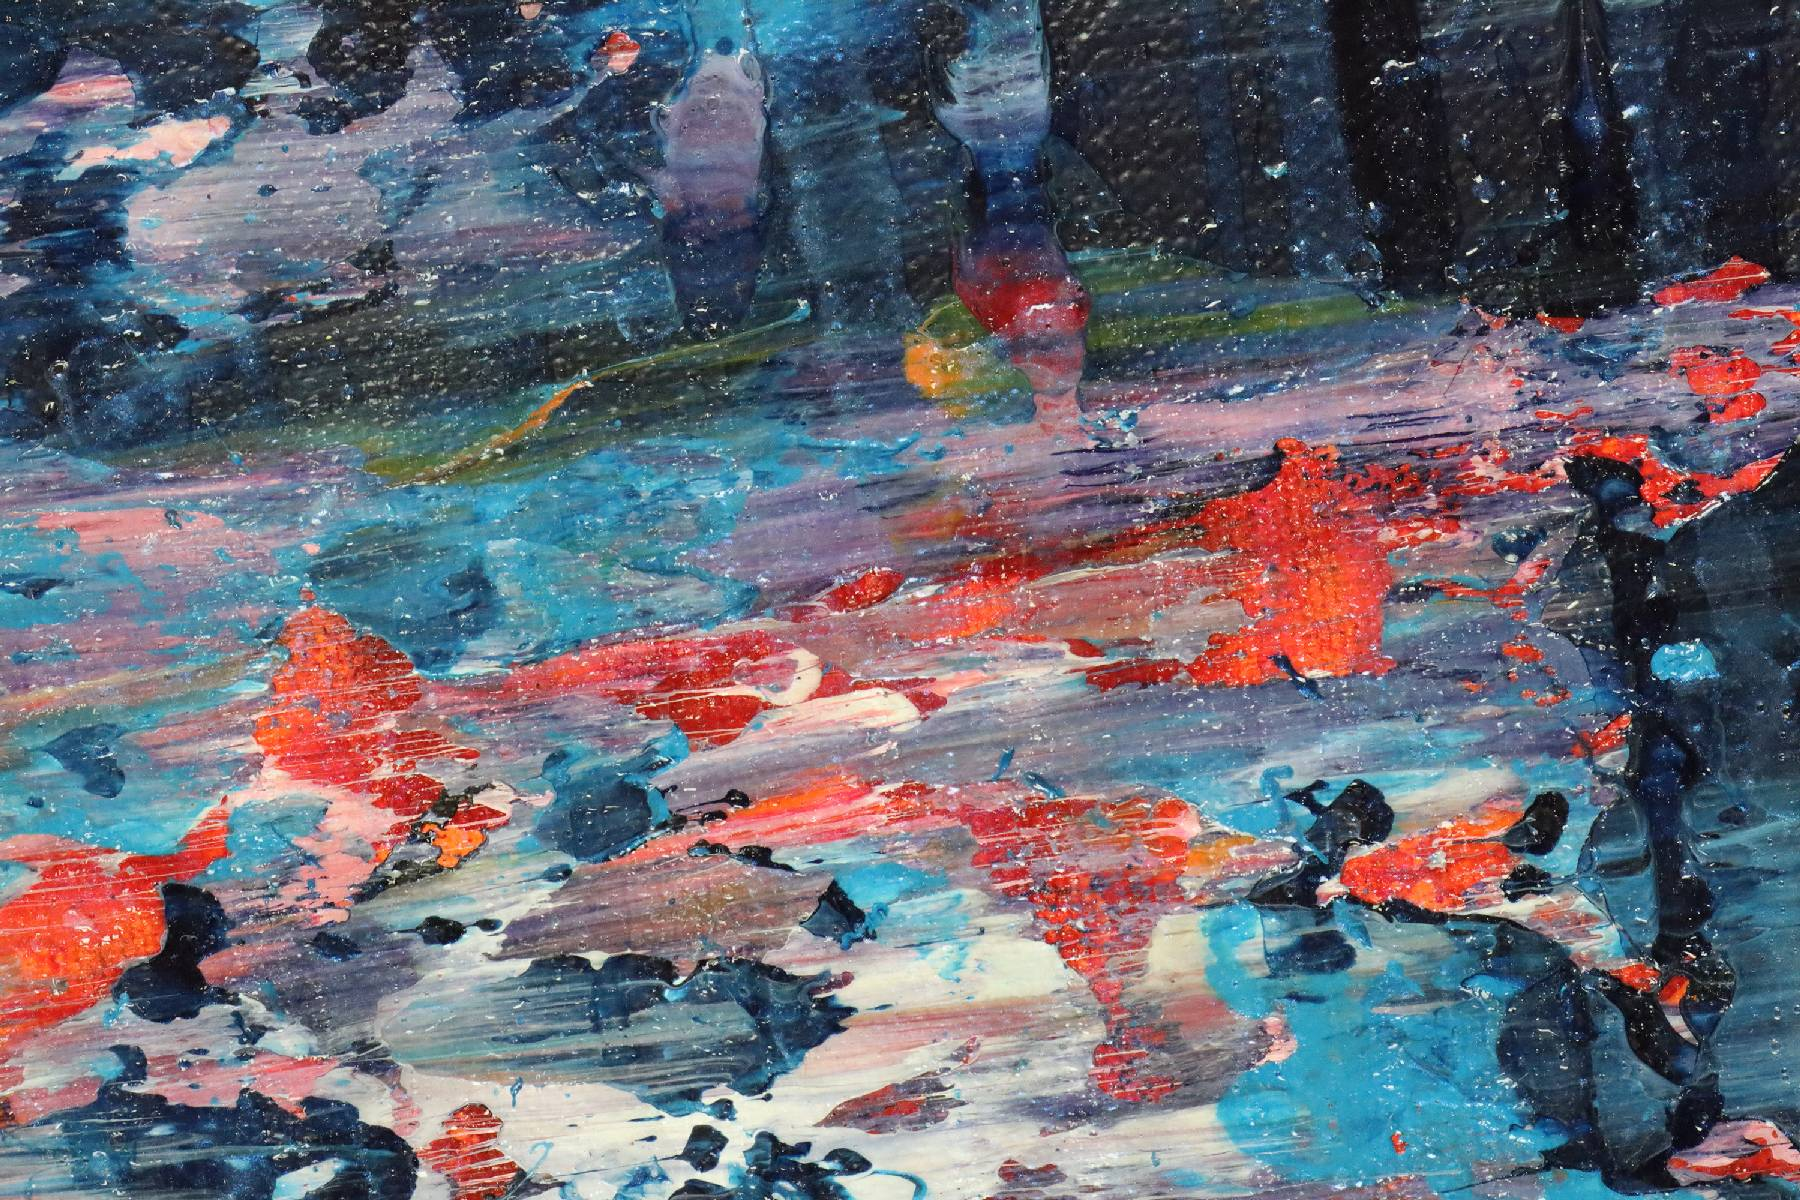 Detail - Torrential Night Storm (A Closer Look) (2020) by Nestor Toro